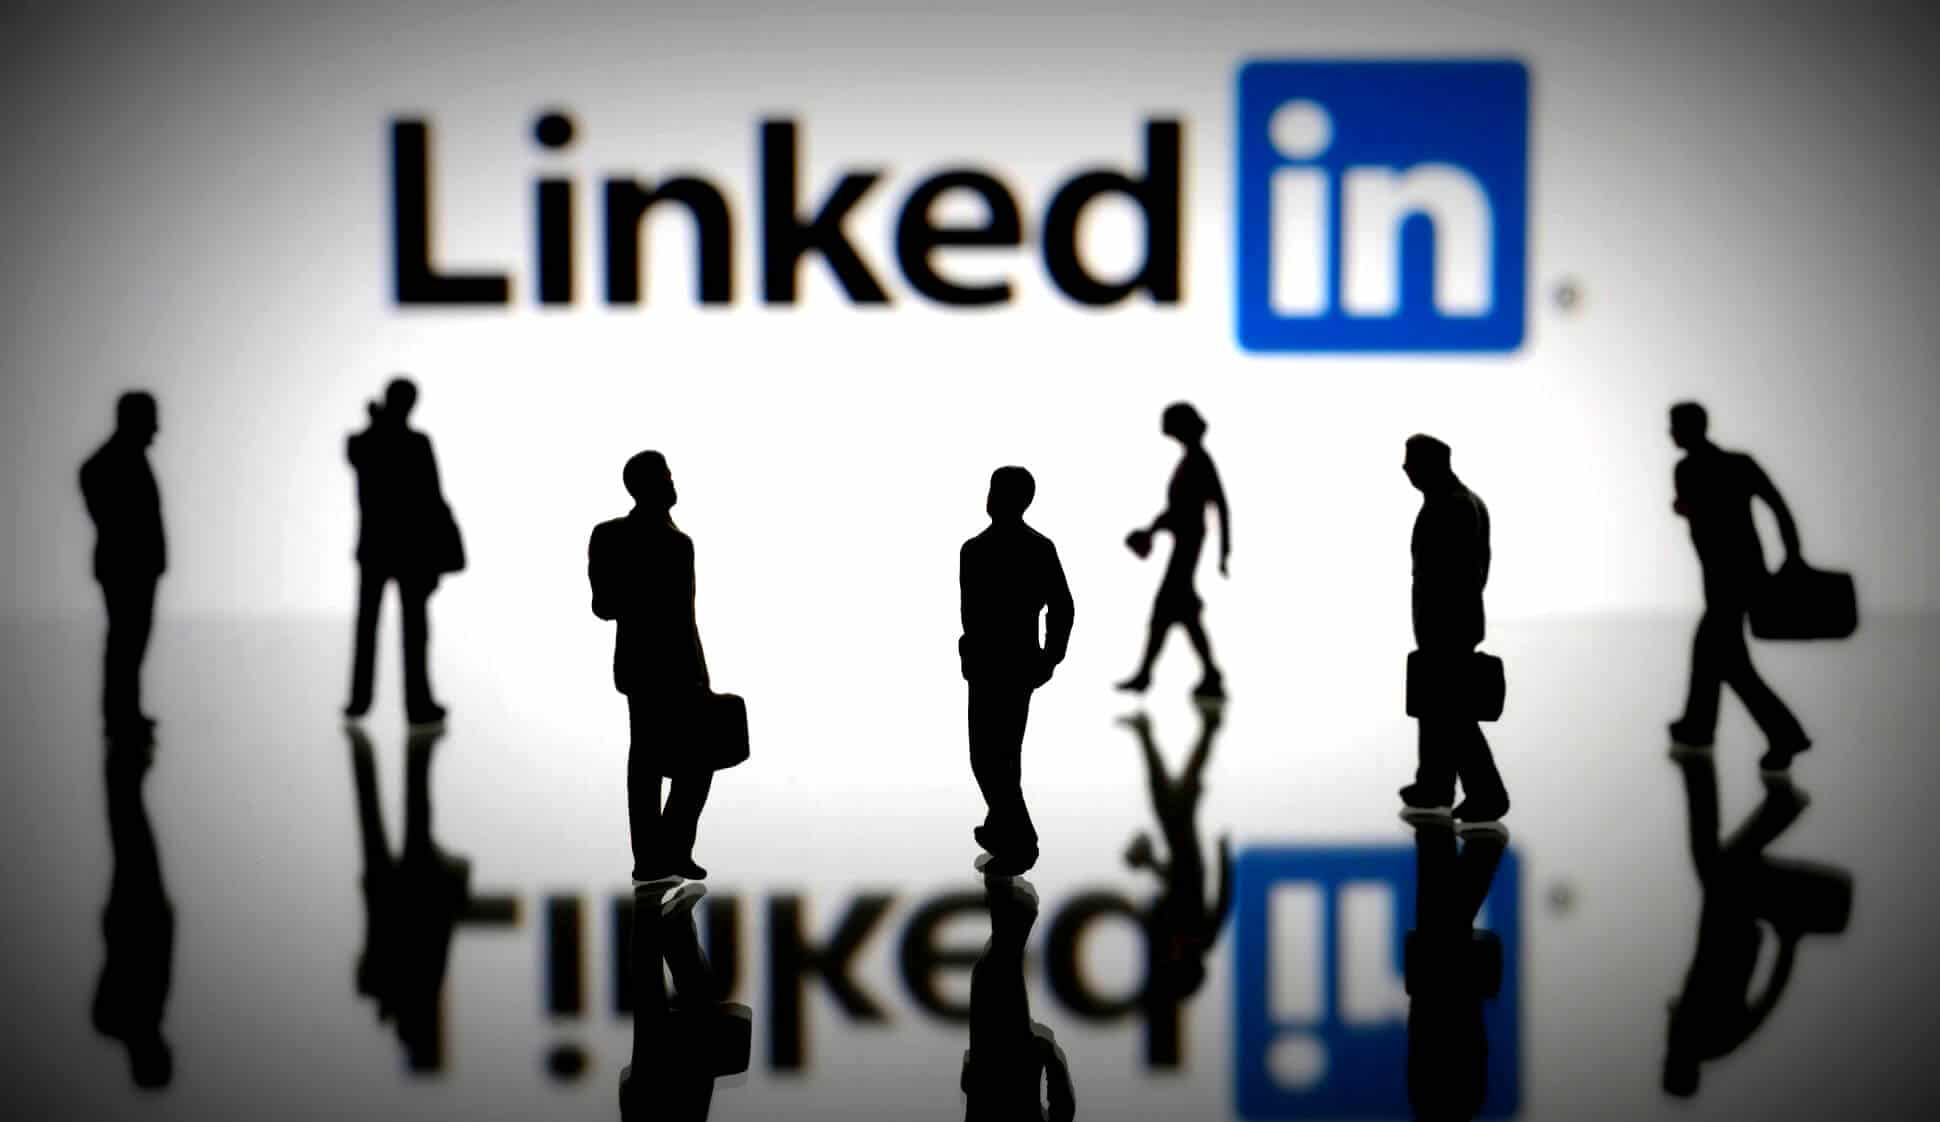 linkedin-people-find-jobs-logo